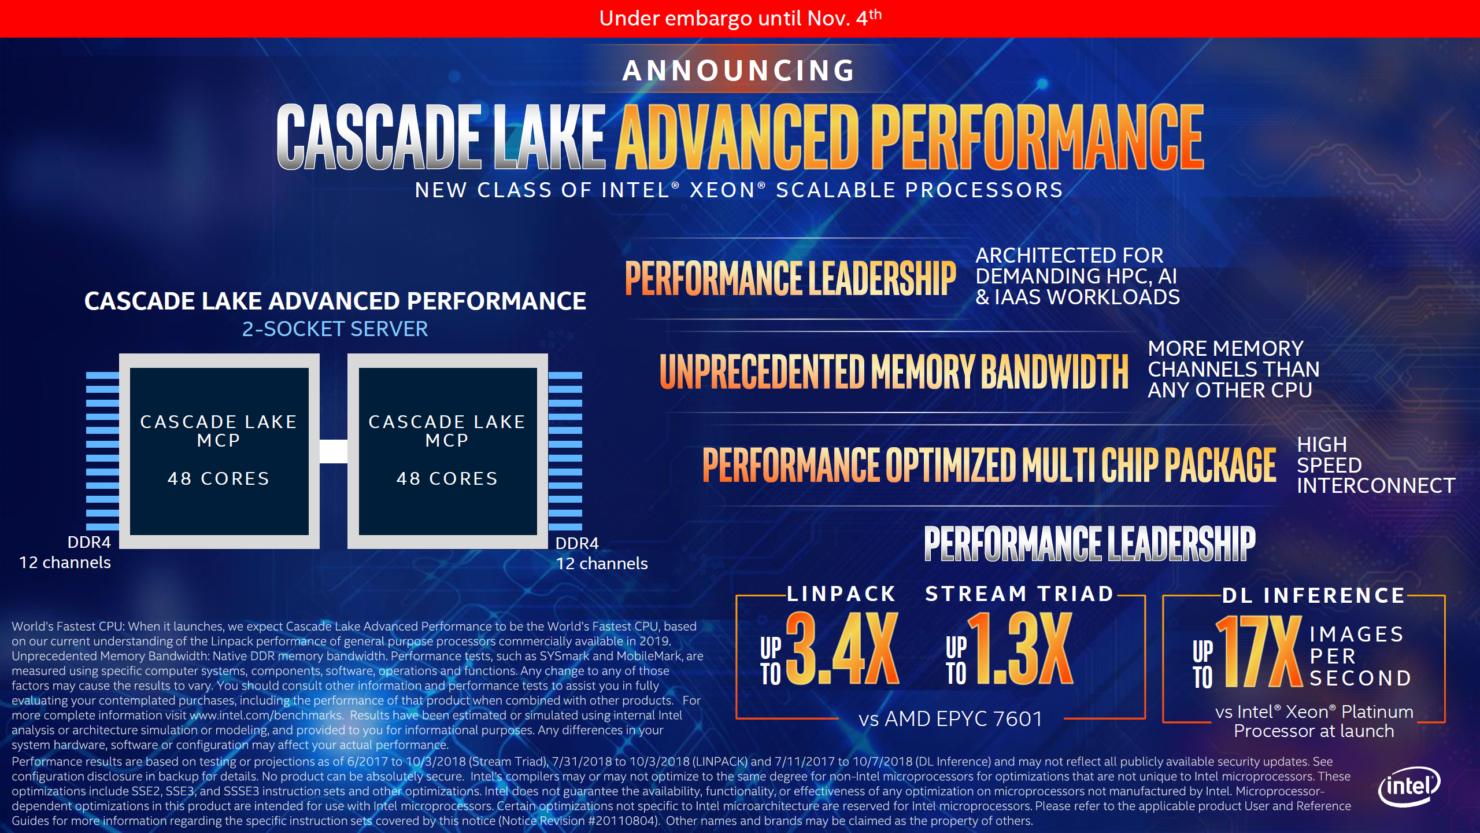 intel-data-center_cascade-lake_2